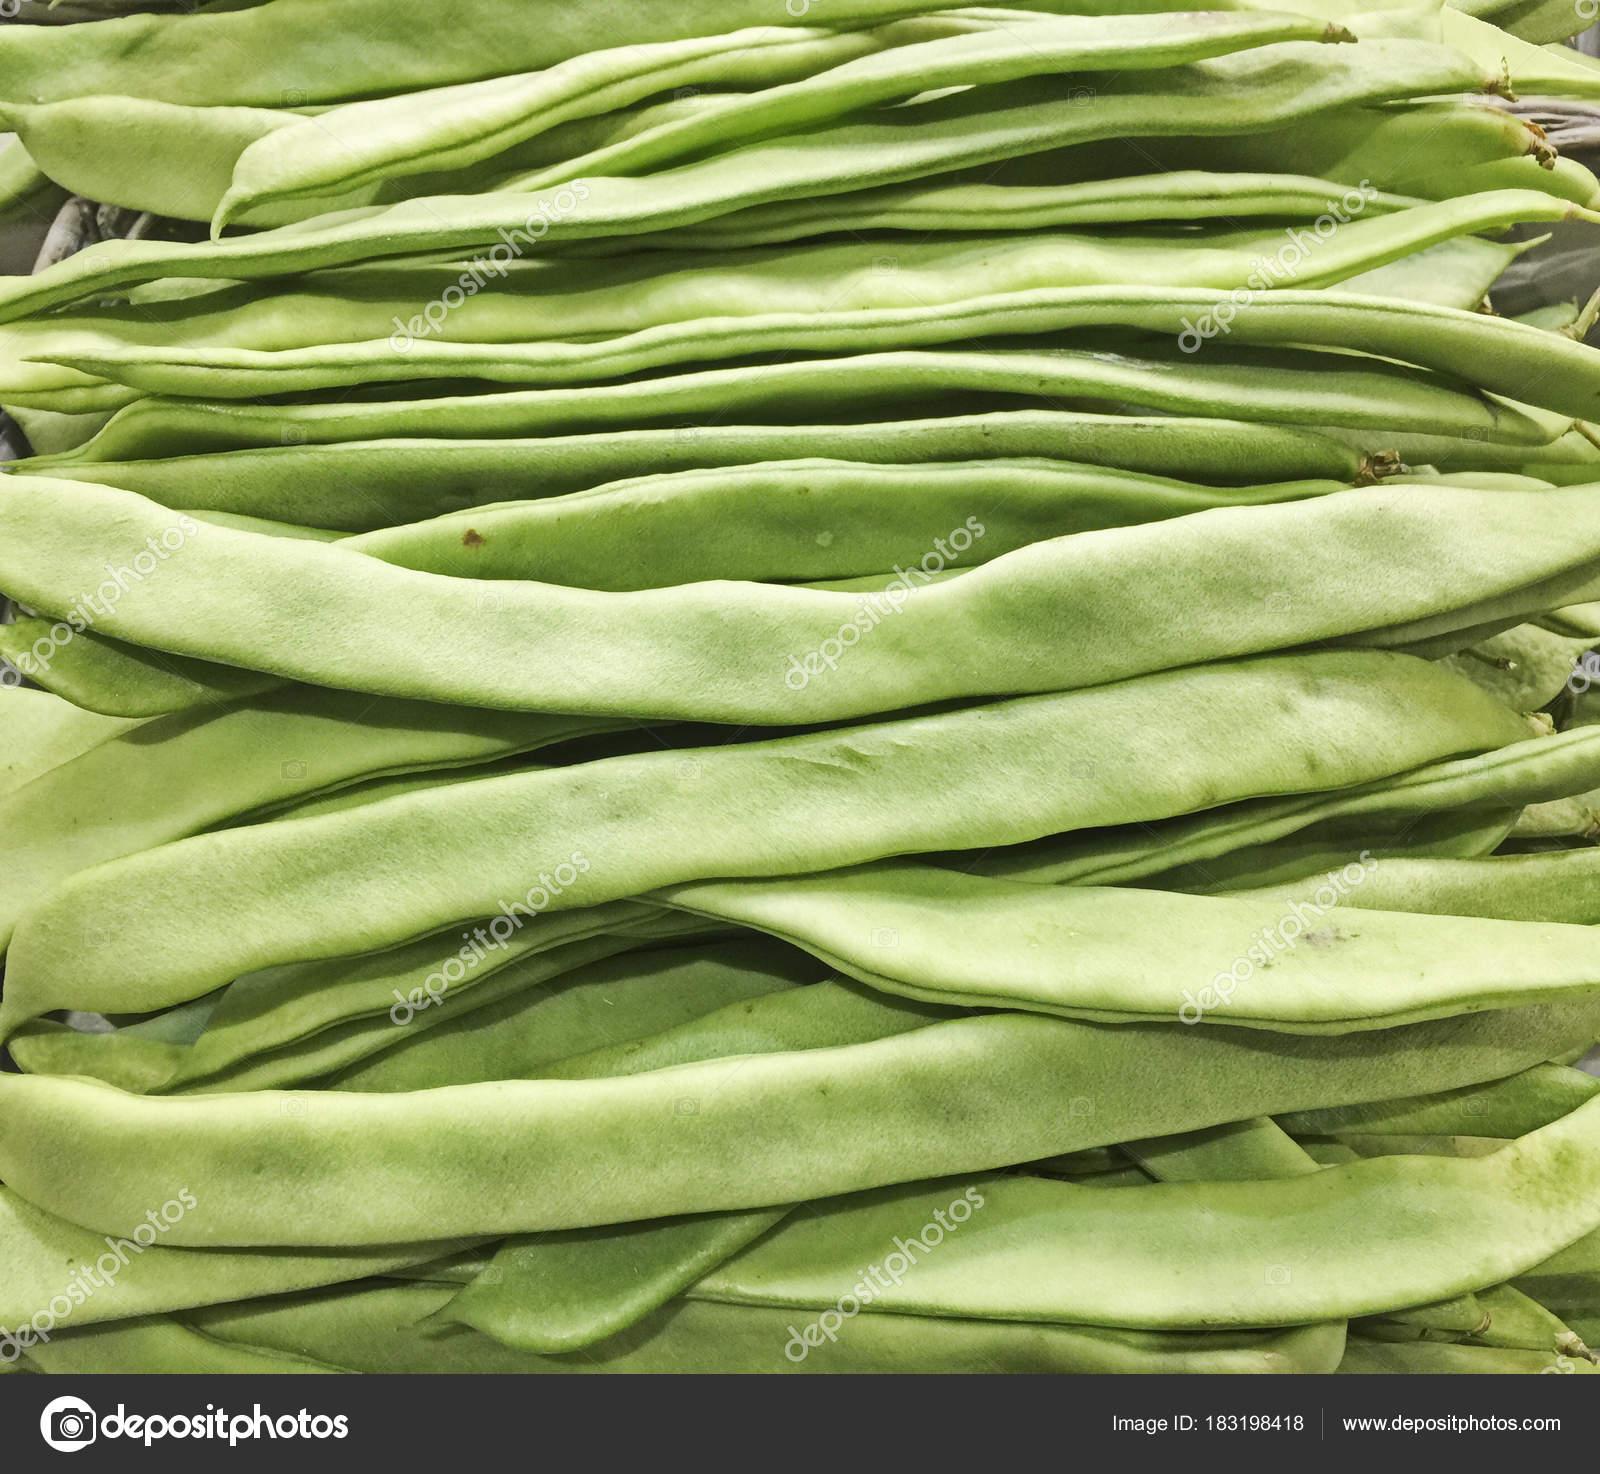 stora gröna bönor